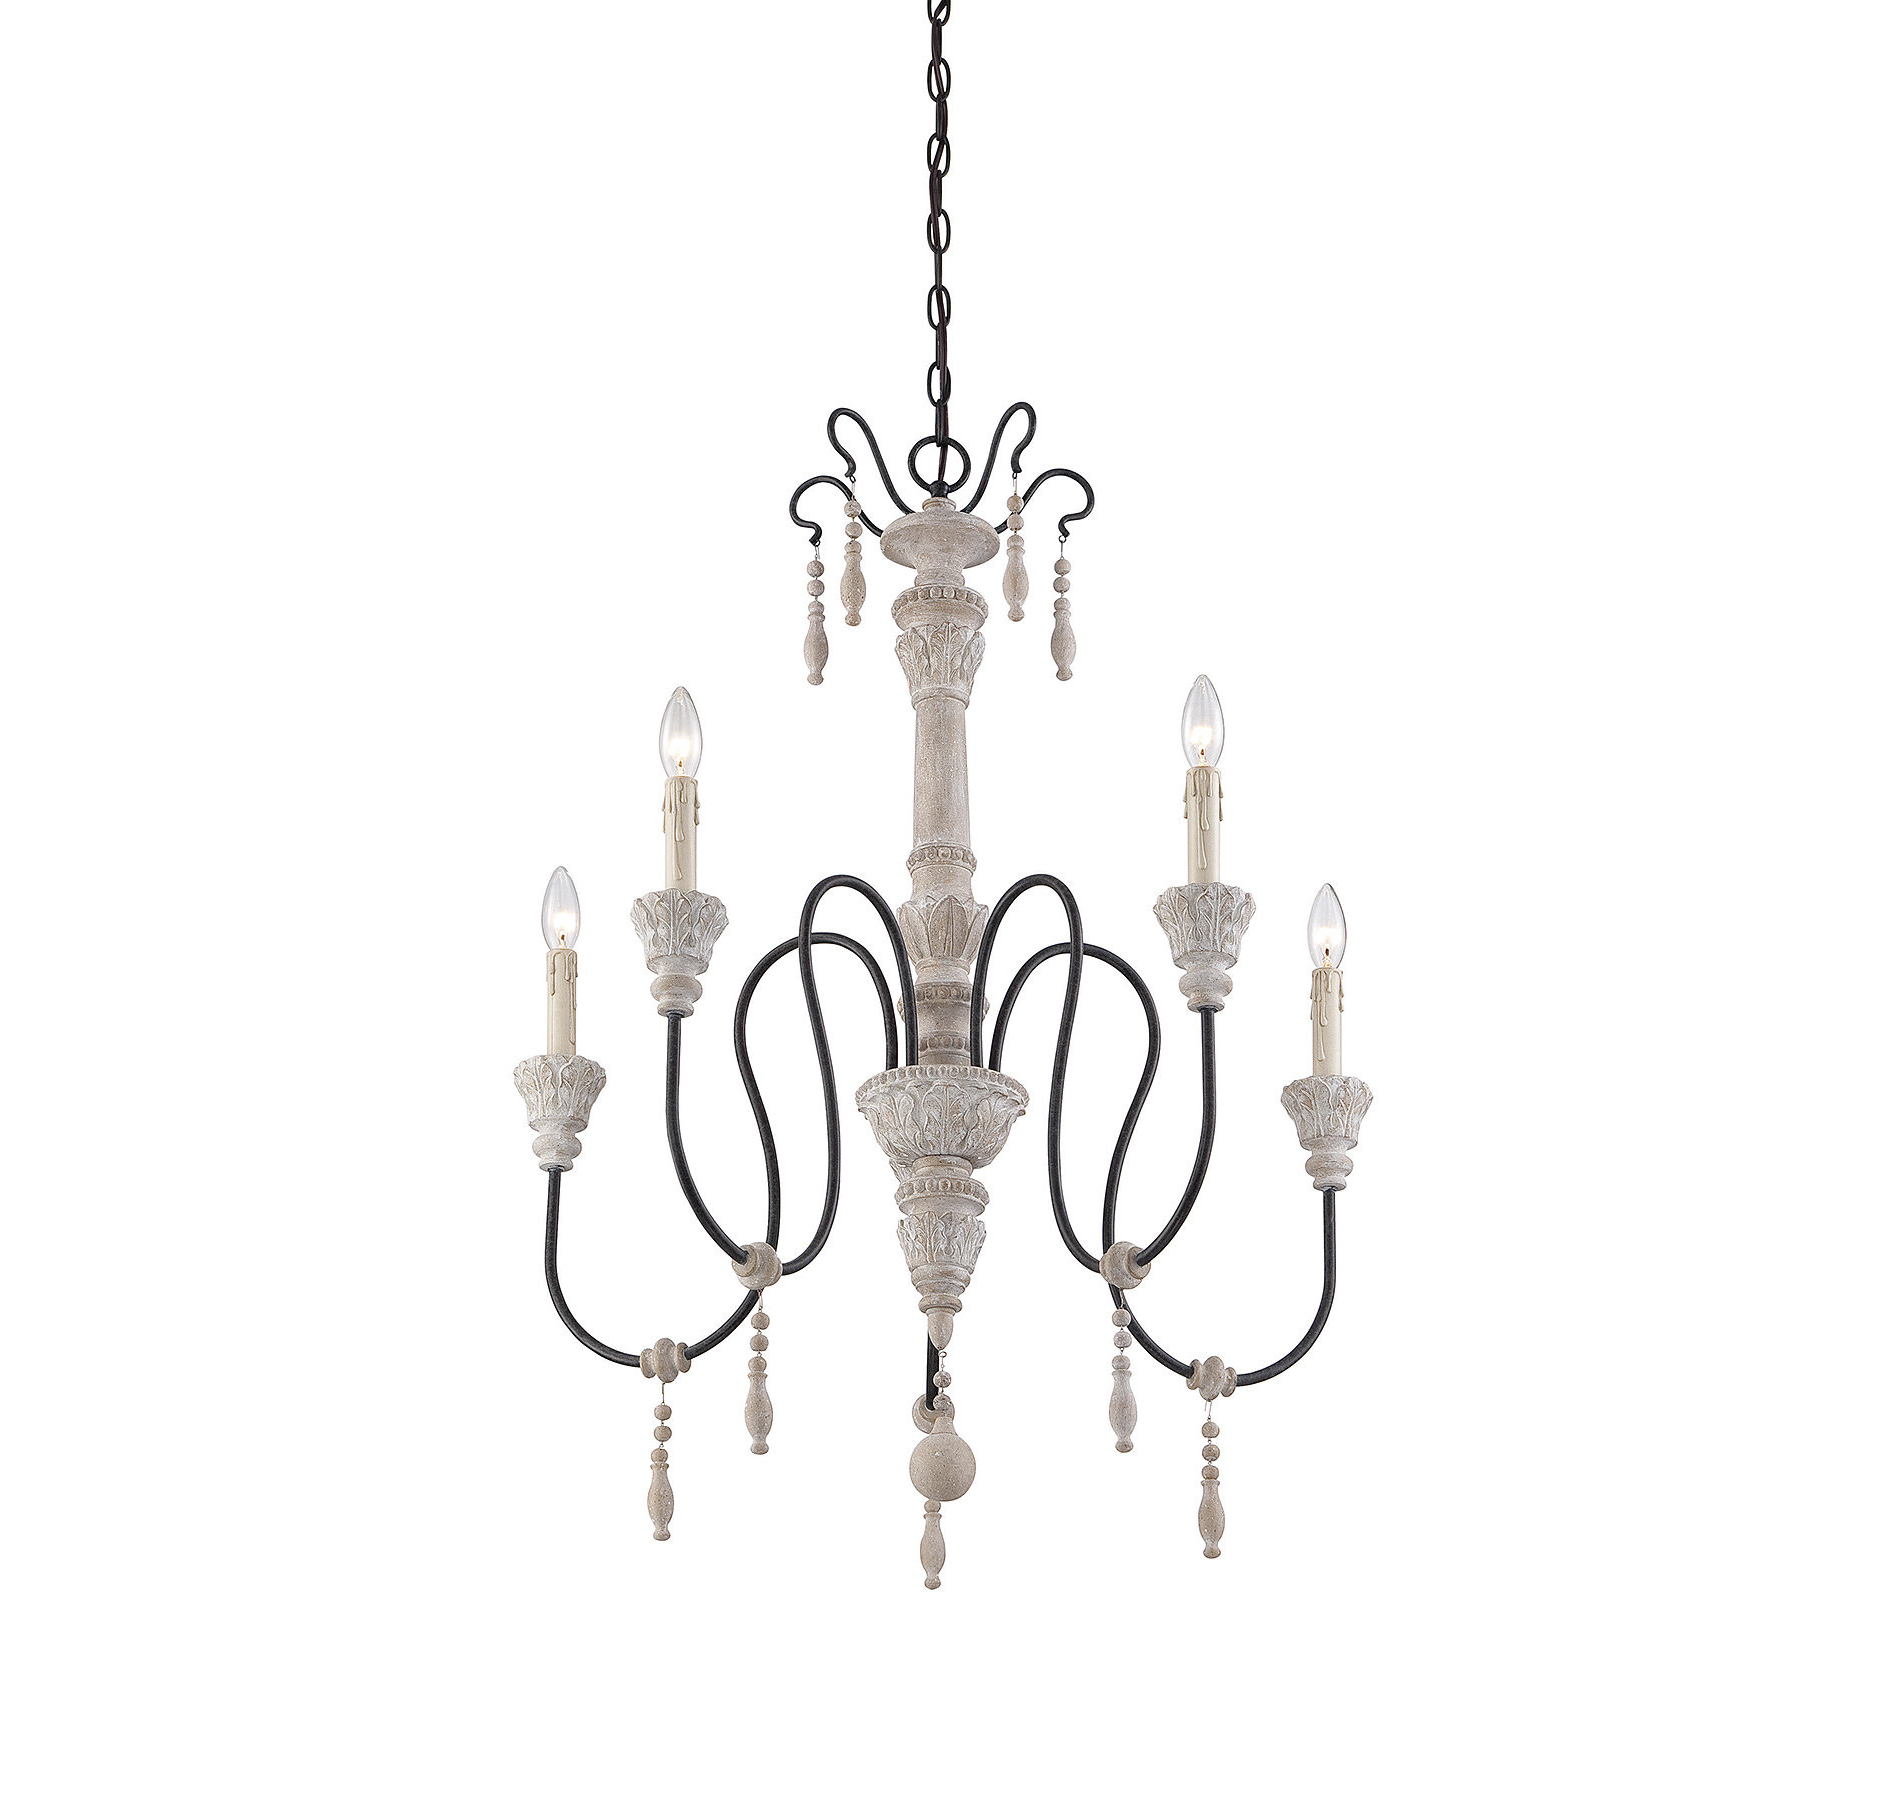 Featured Photo of Corneau 5 Light Chandeliers